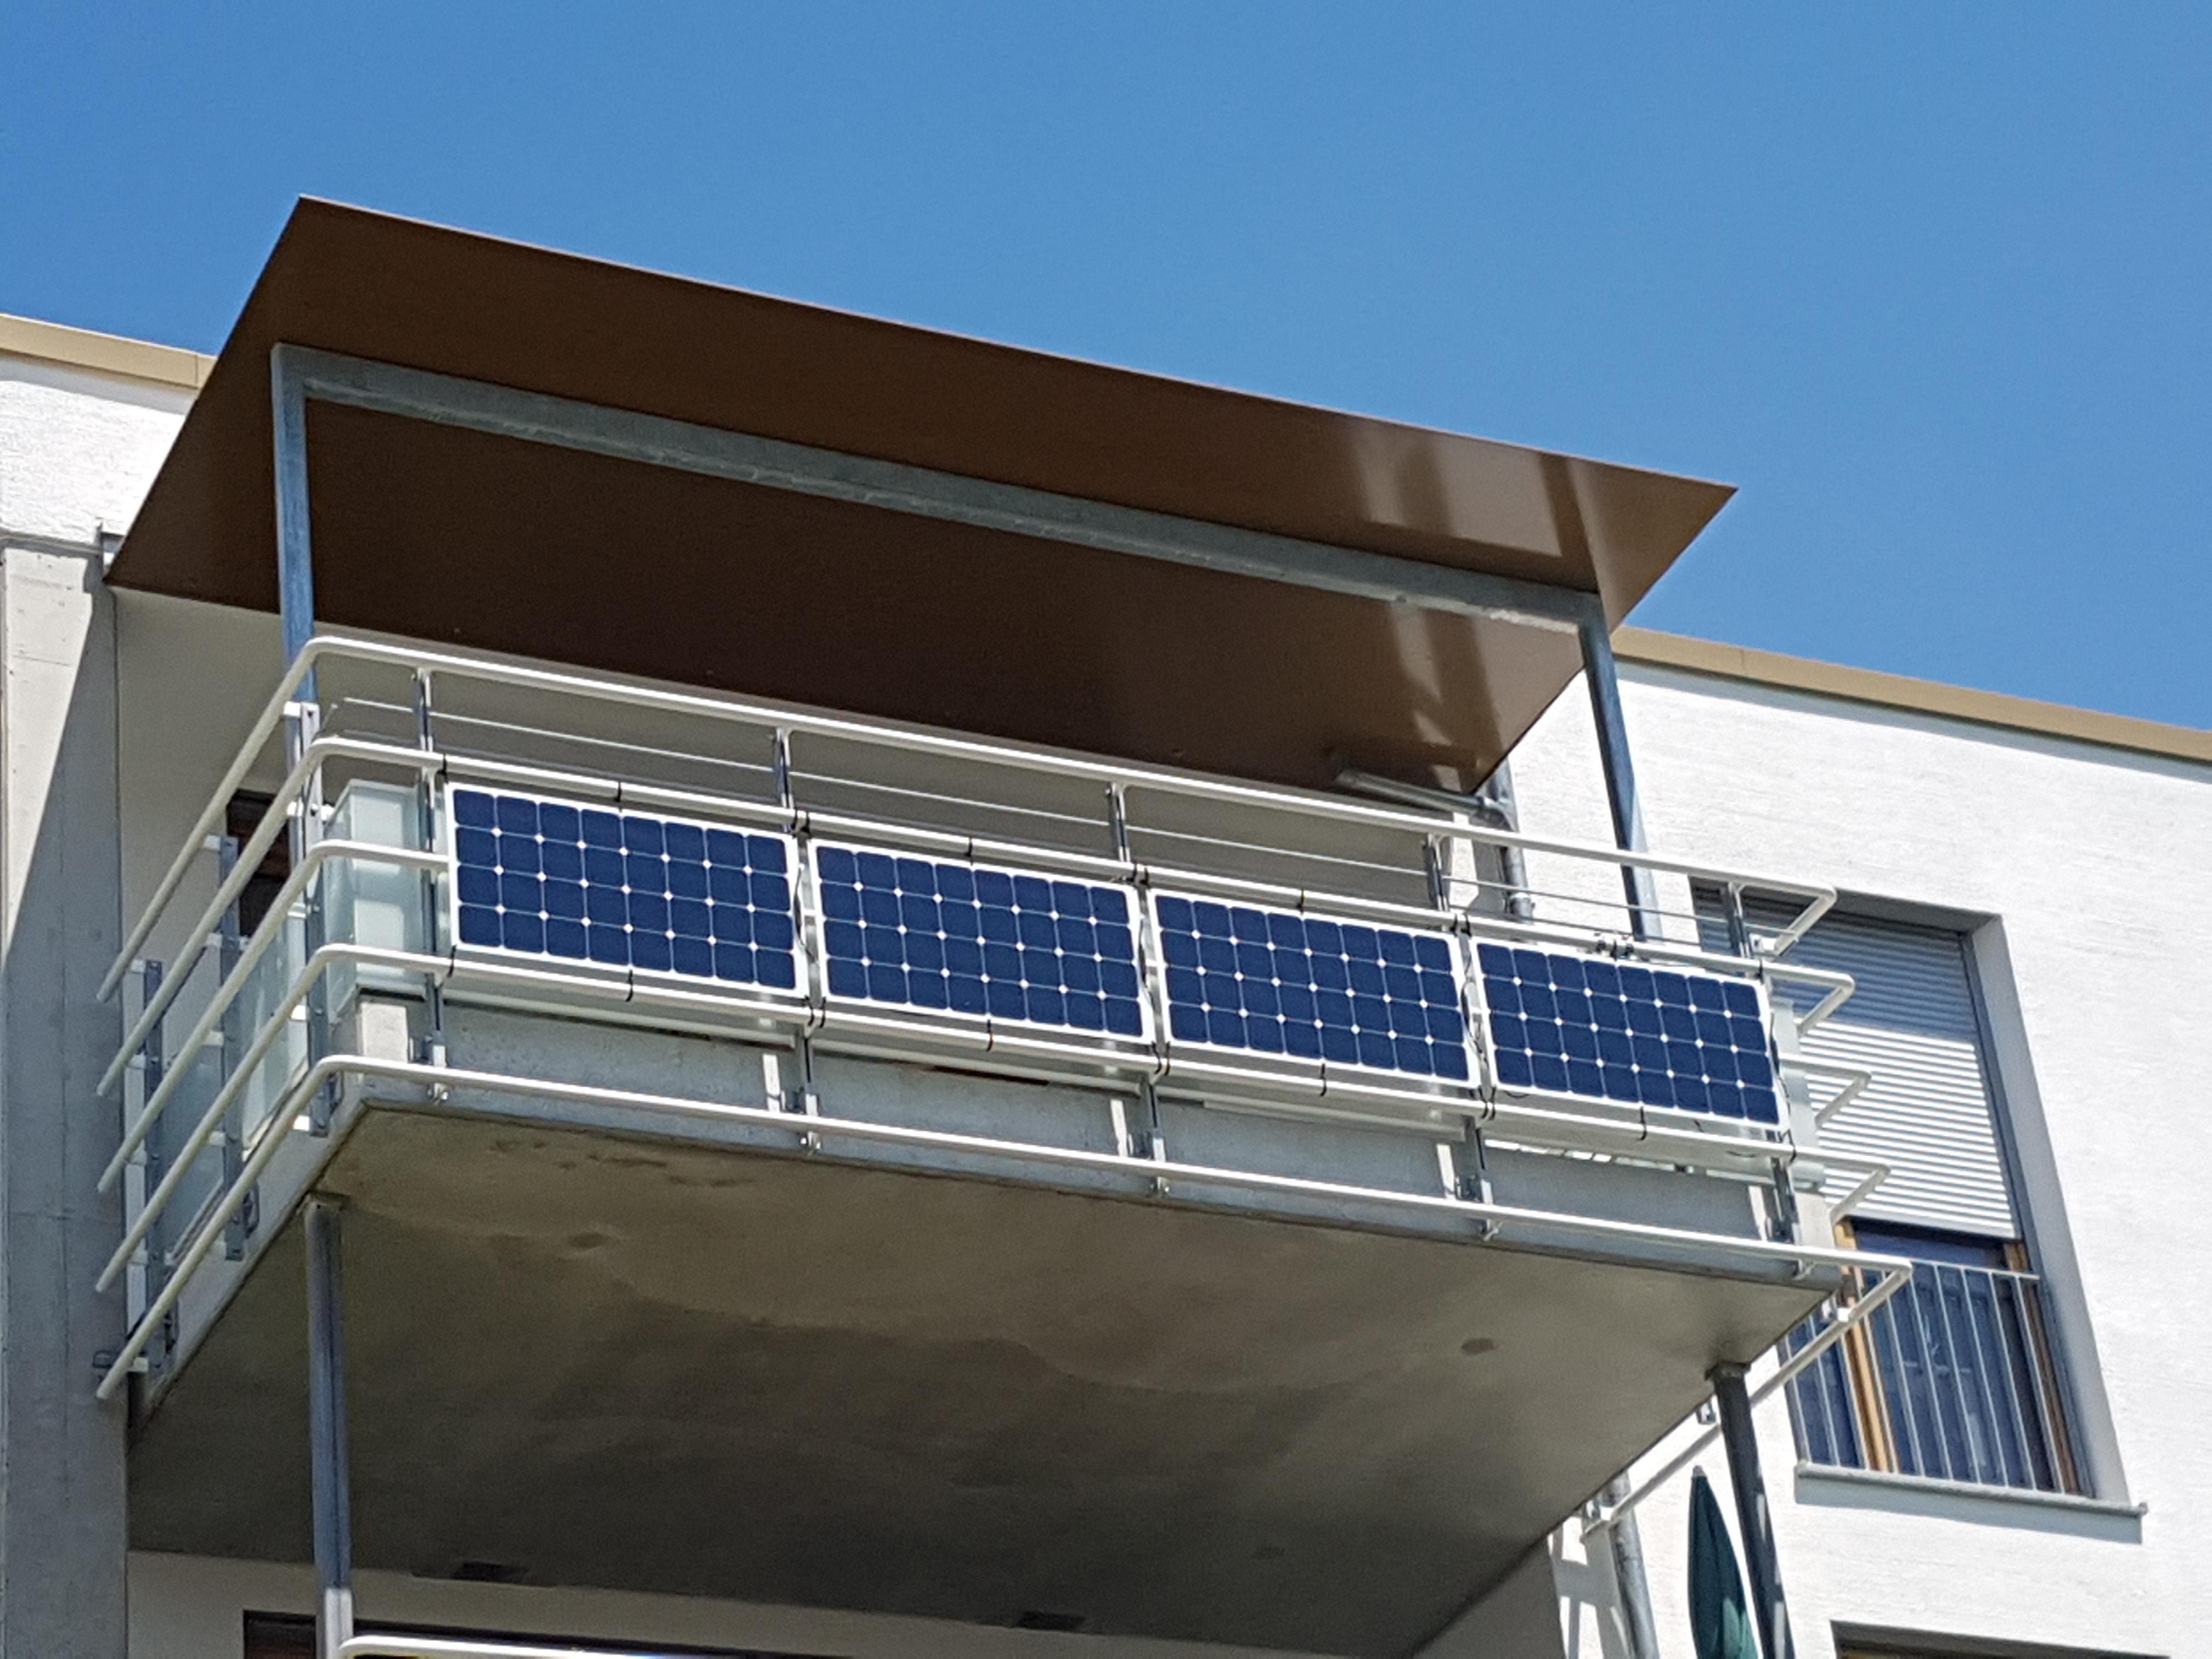 © Energieagentur Kreis Konstanz